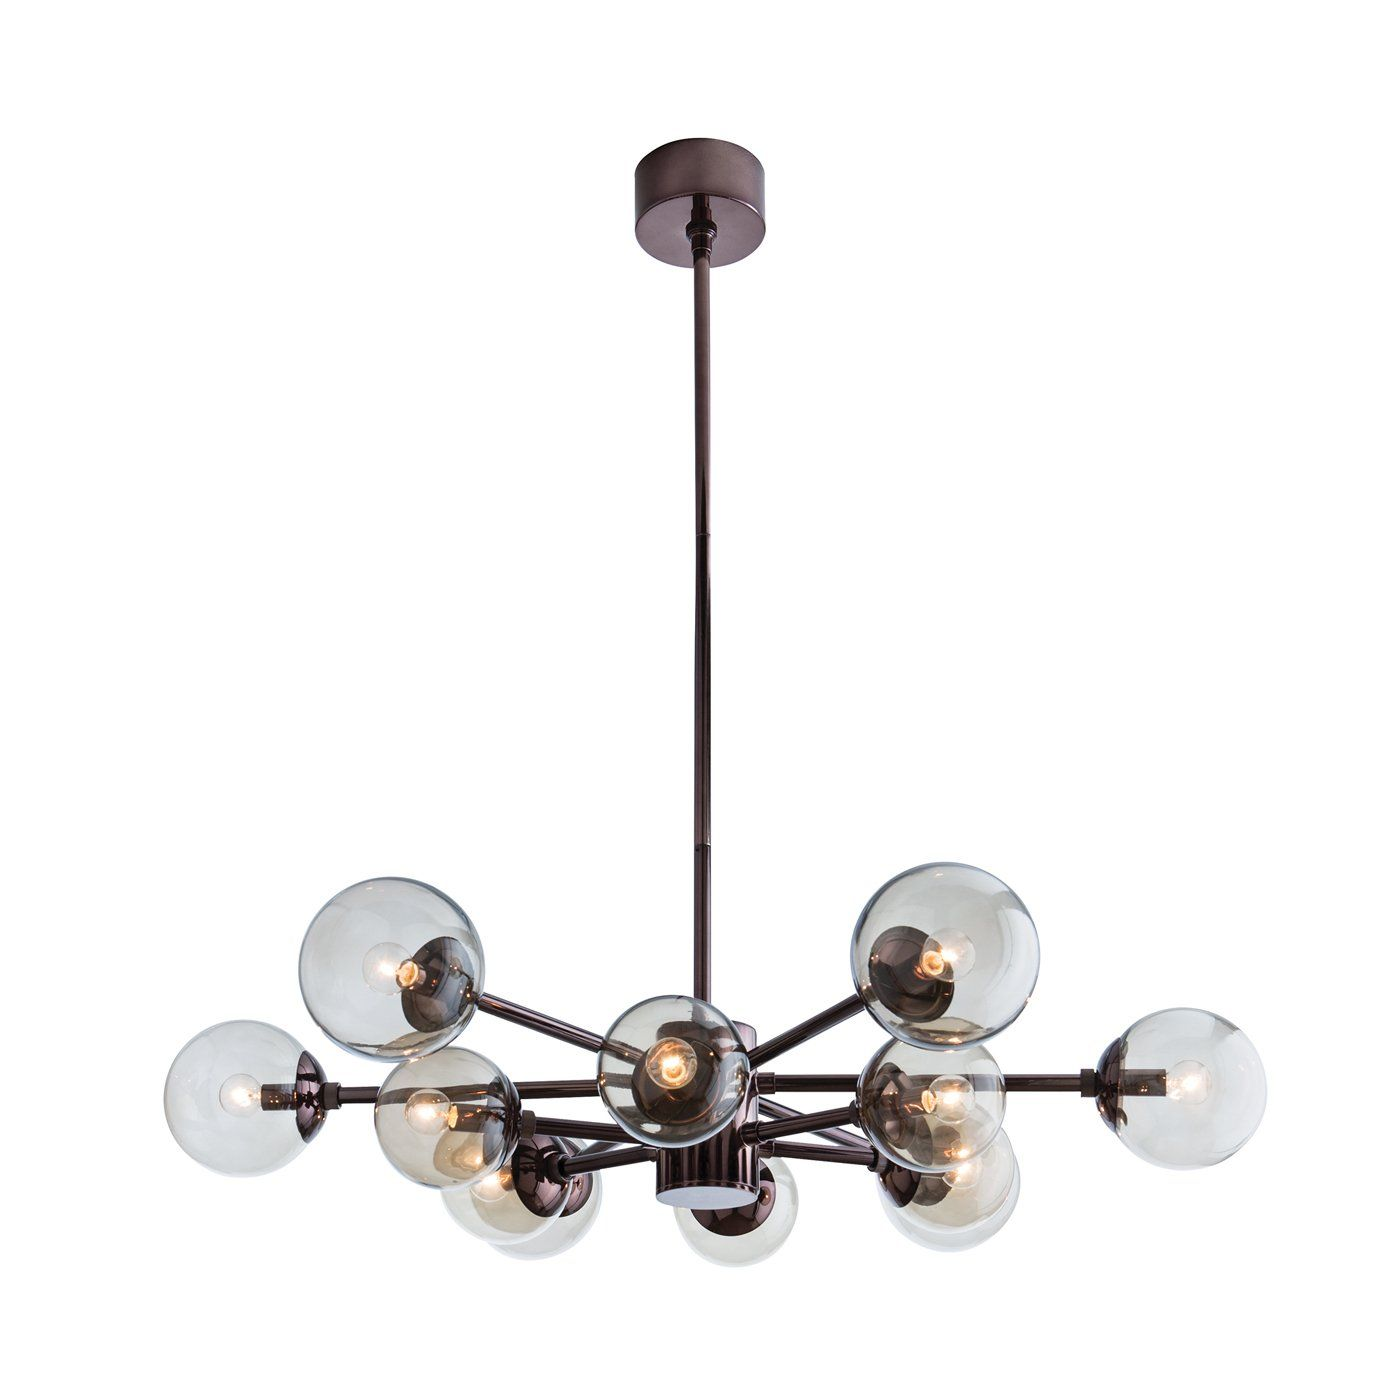 Shop arteriors home 8901 karrington chandelier at atg stores browse explore sputnik chandelier chandeliers and more arubaitofo Images